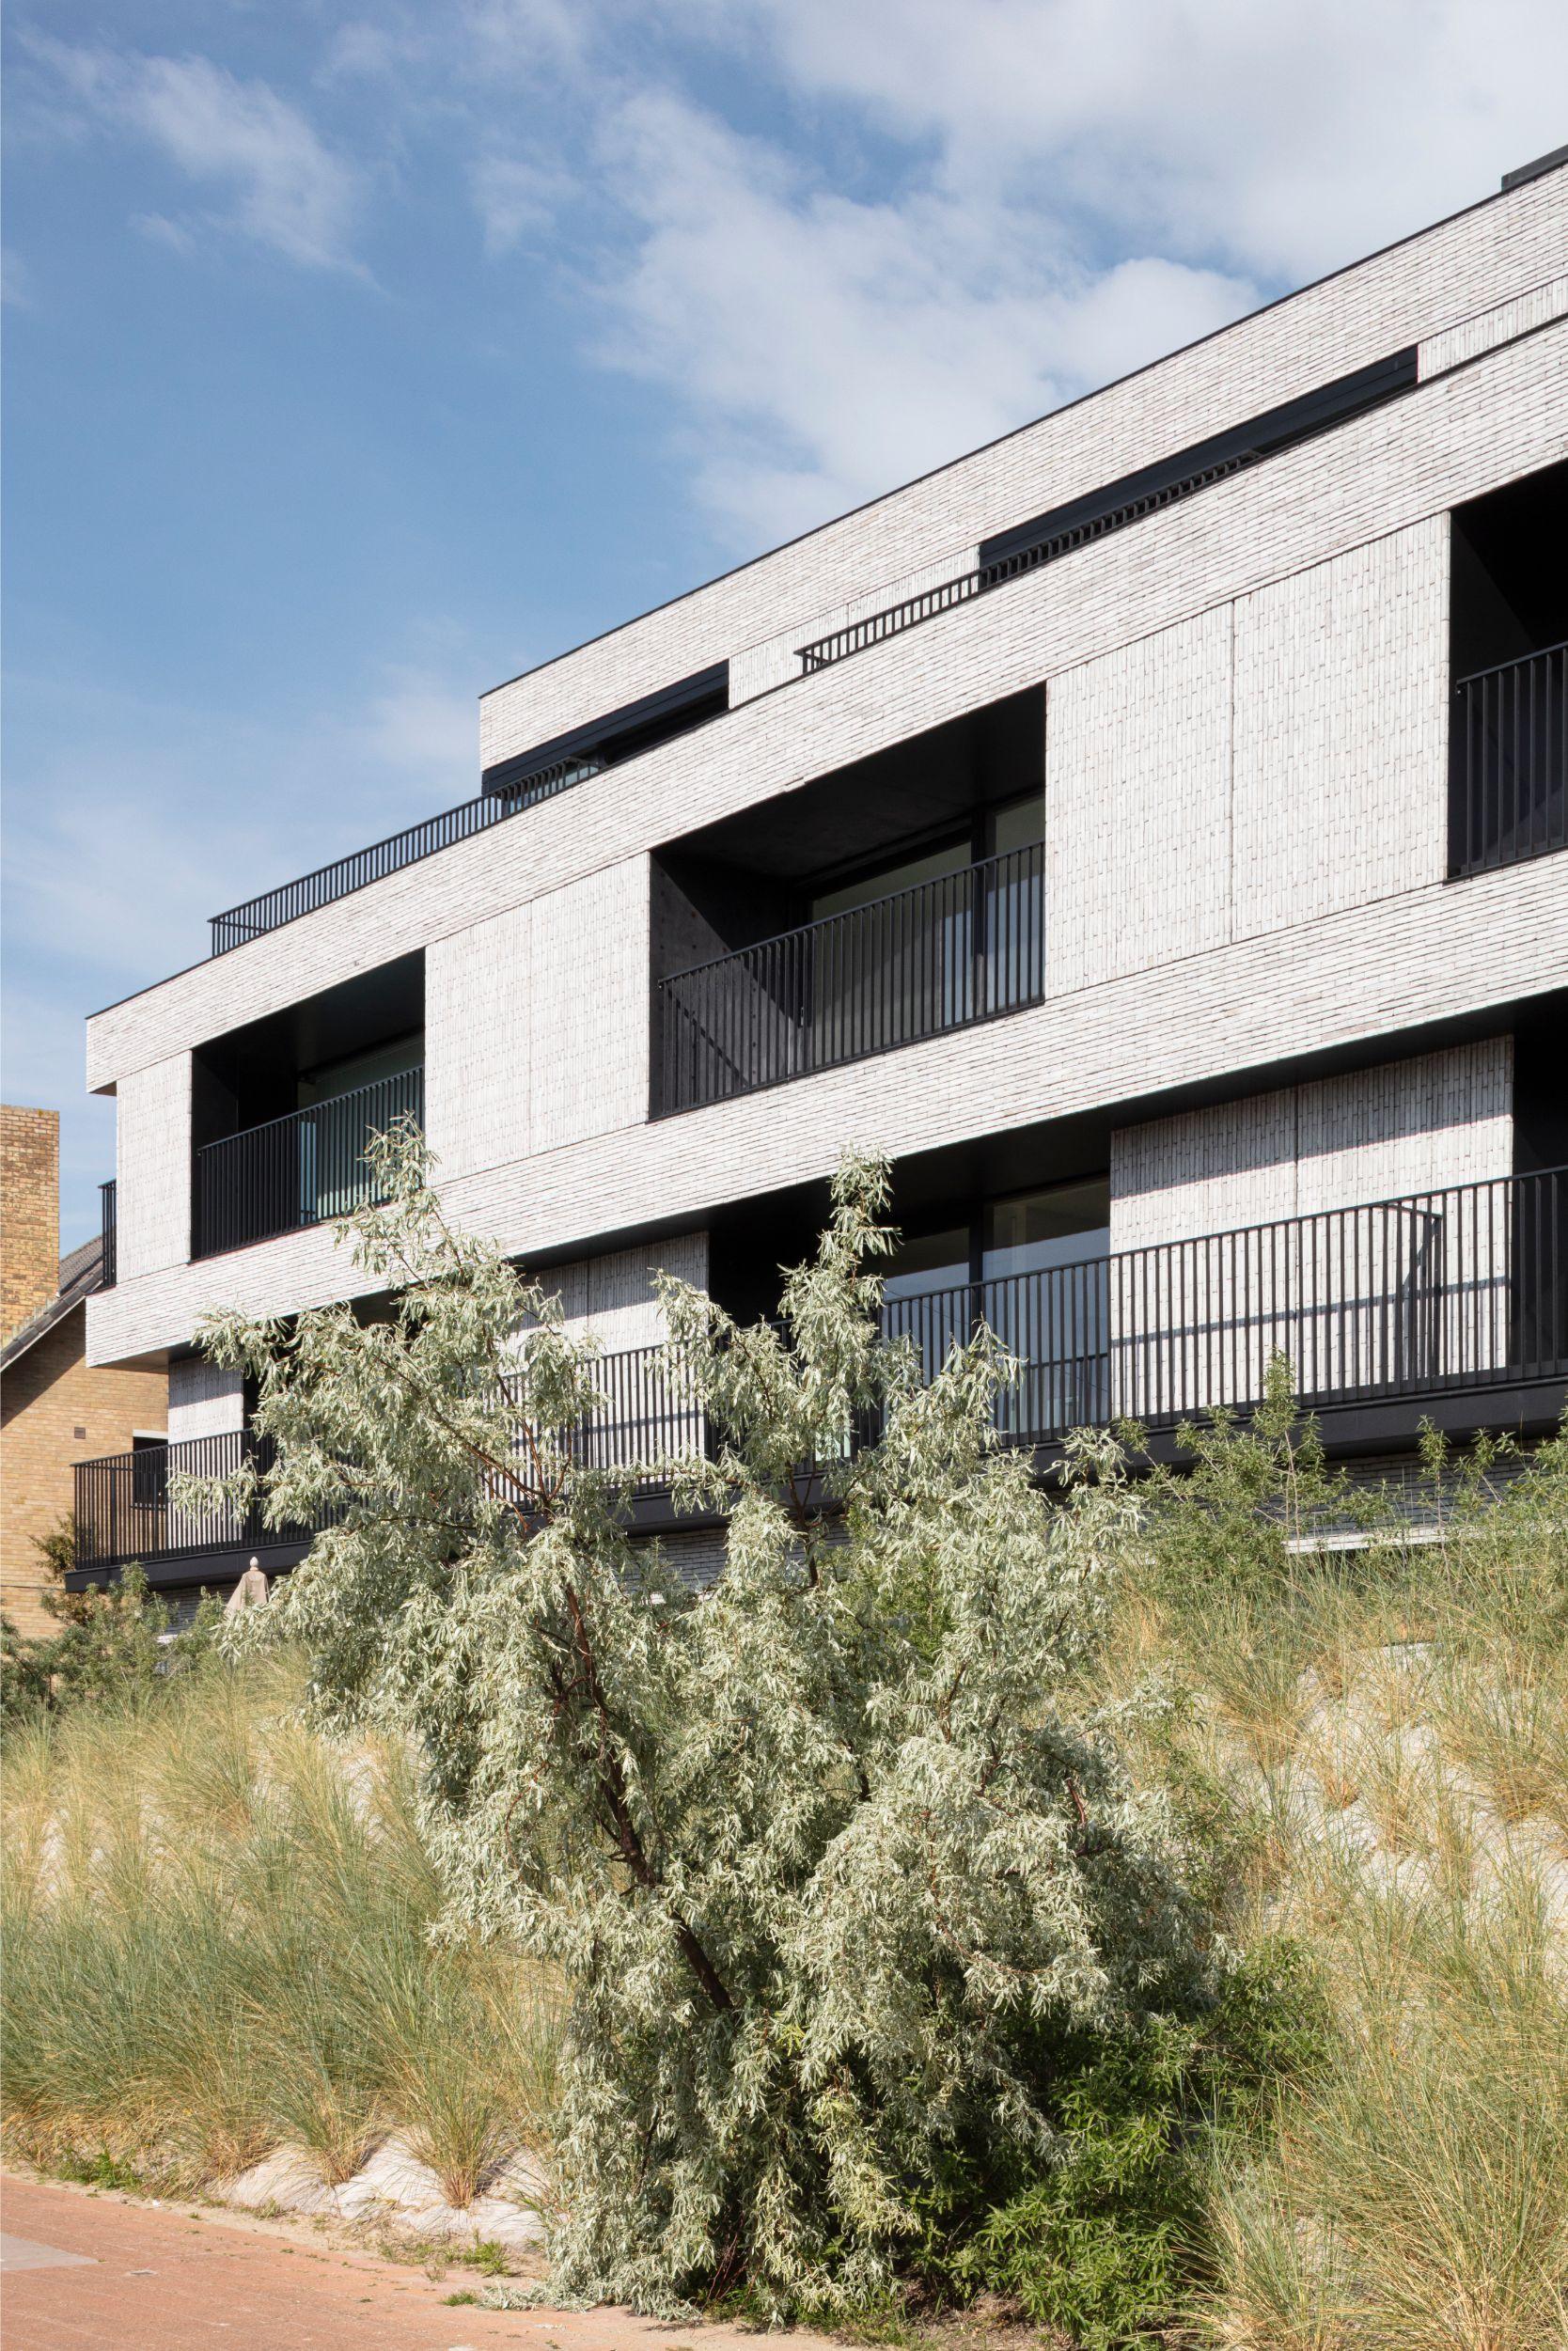 Pierre Paulin - Rietveldprojects - Sint-Idesbald - Tvdv10.jpg